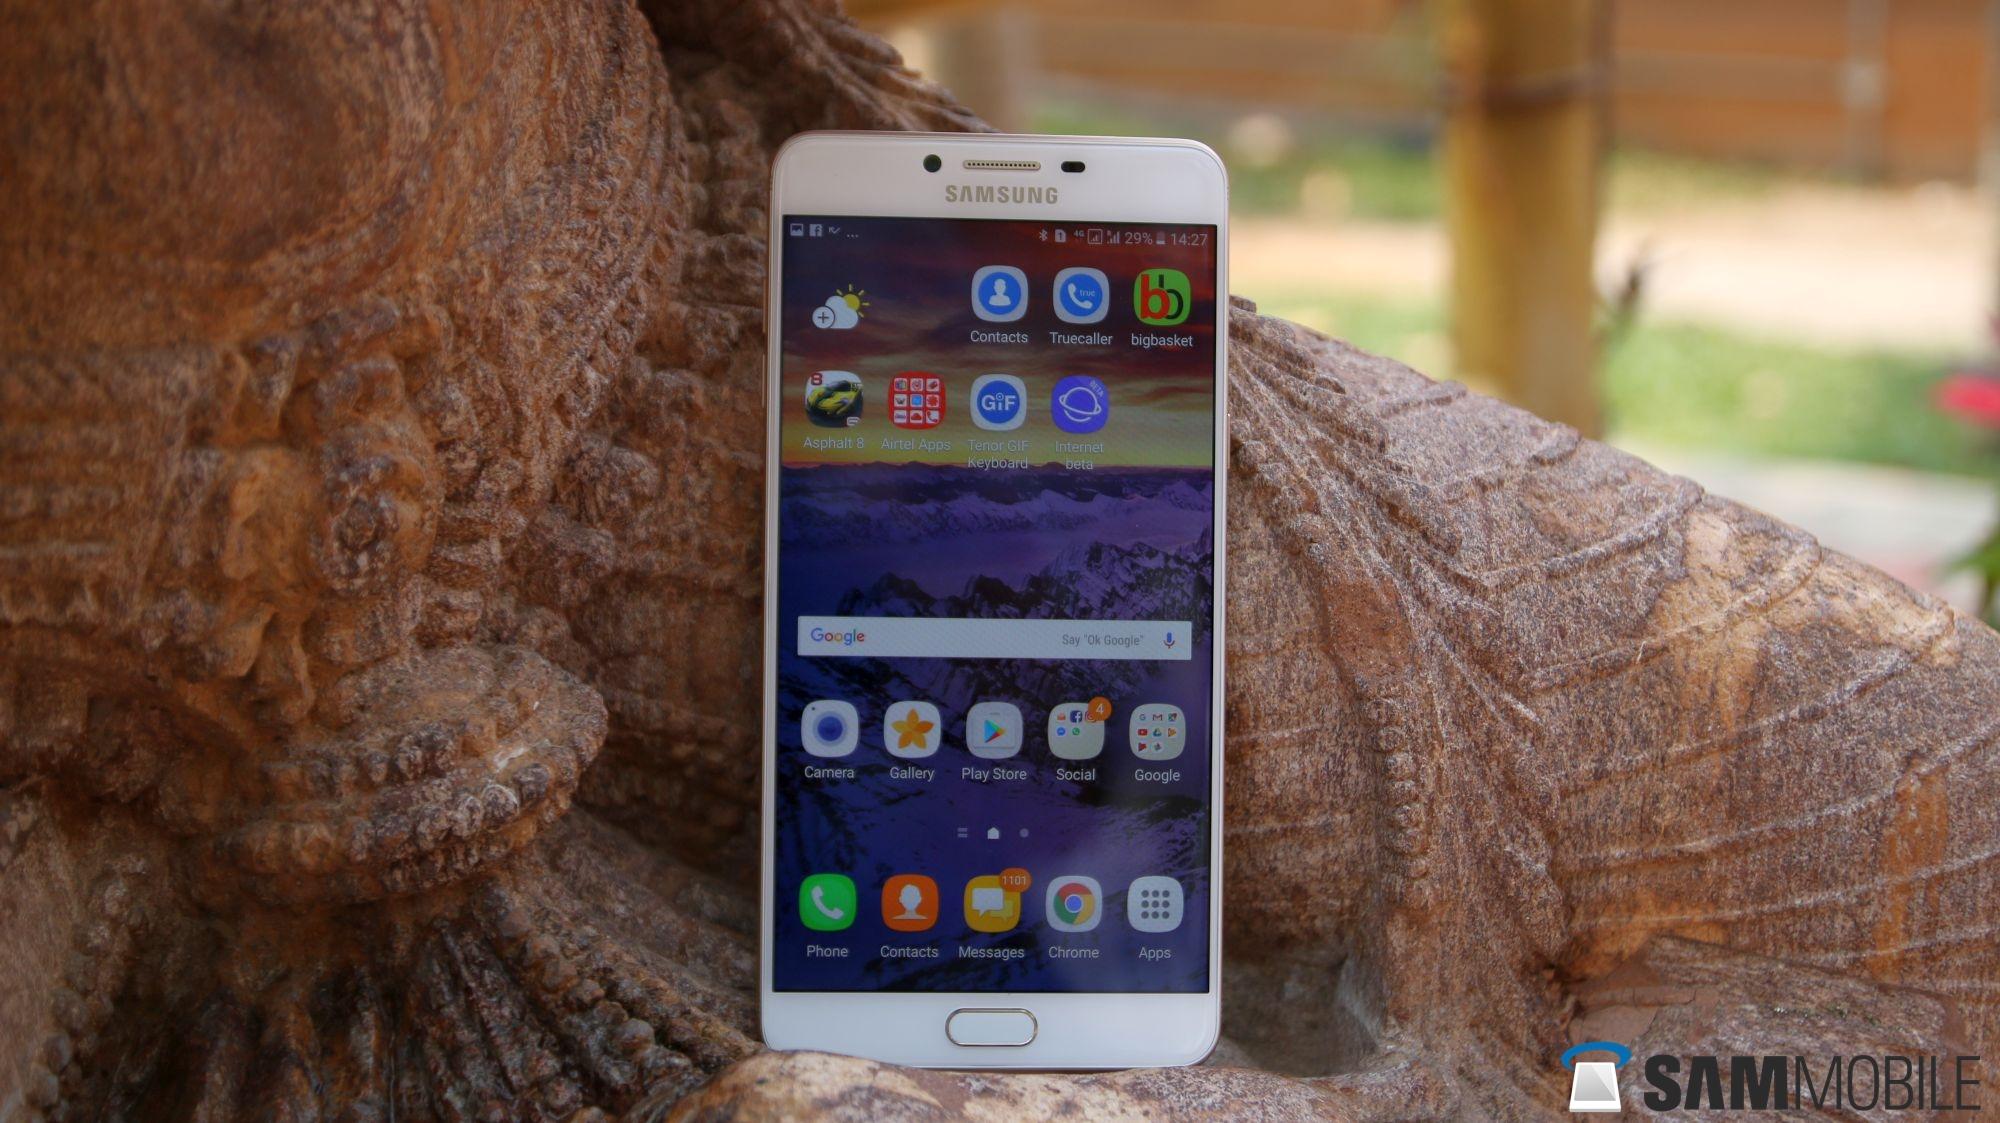 Hd wallpaper c9 pro - Galaxy C9 Pro Review 14